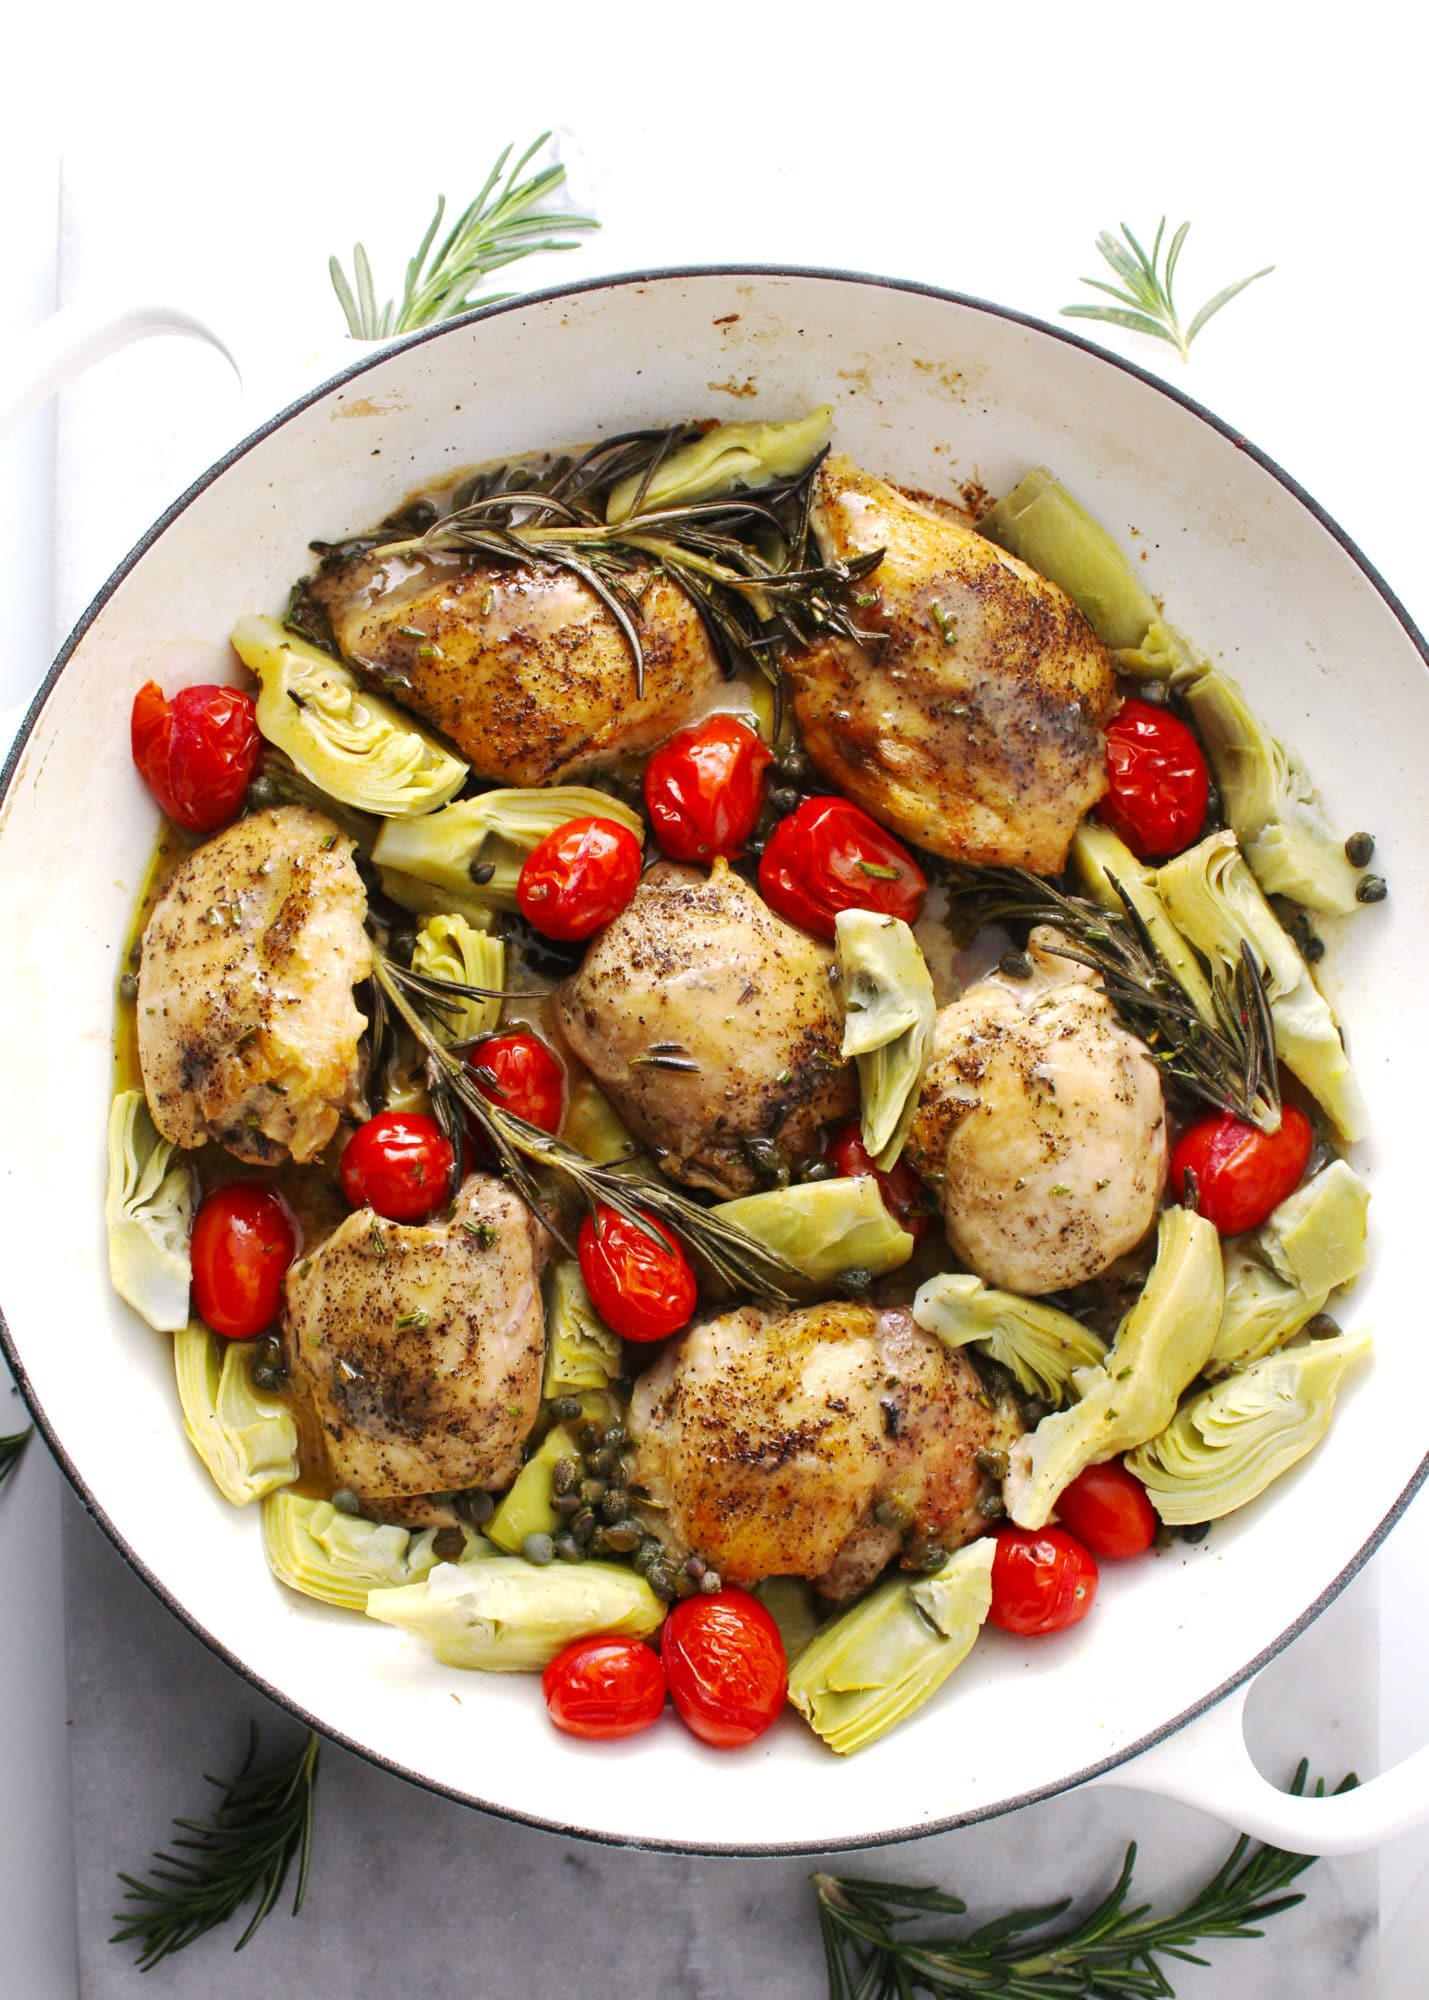 Charred Rosemary Vinaigrette Chicken